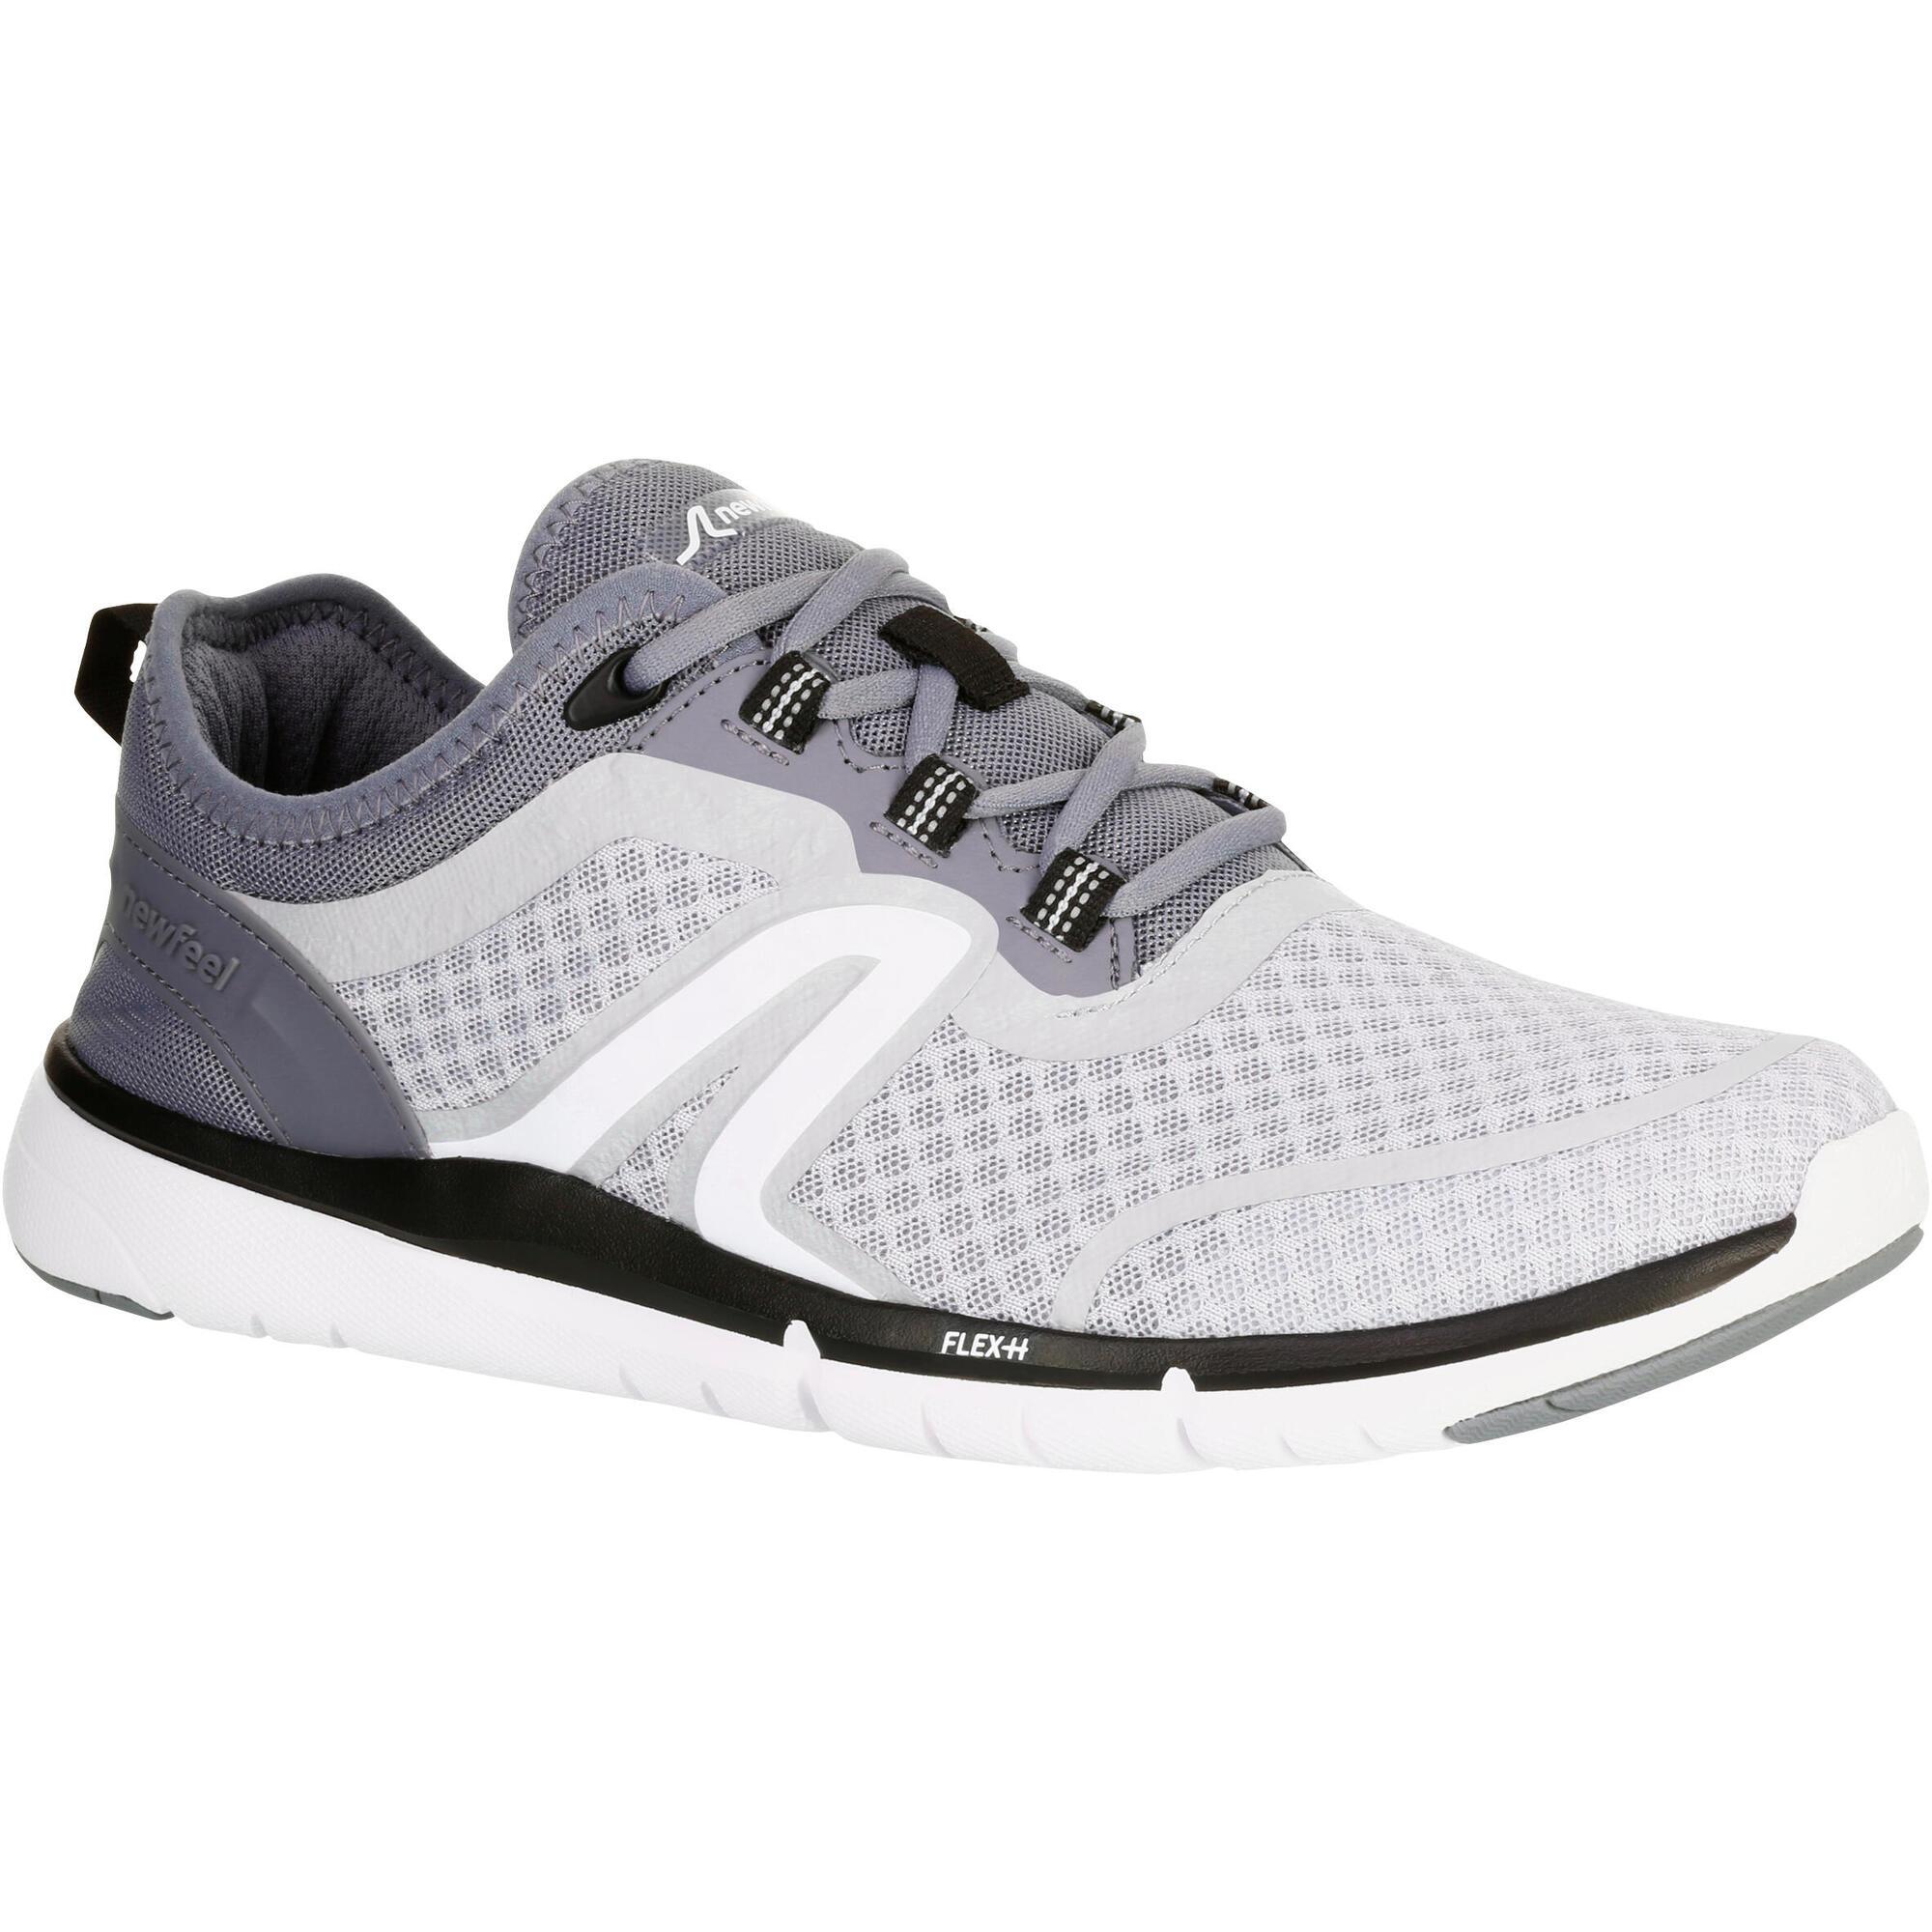 chaussures marche sportive homme soft 540 mesh gris newfeel. Black Bedroom Furniture Sets. Home Design Ideas